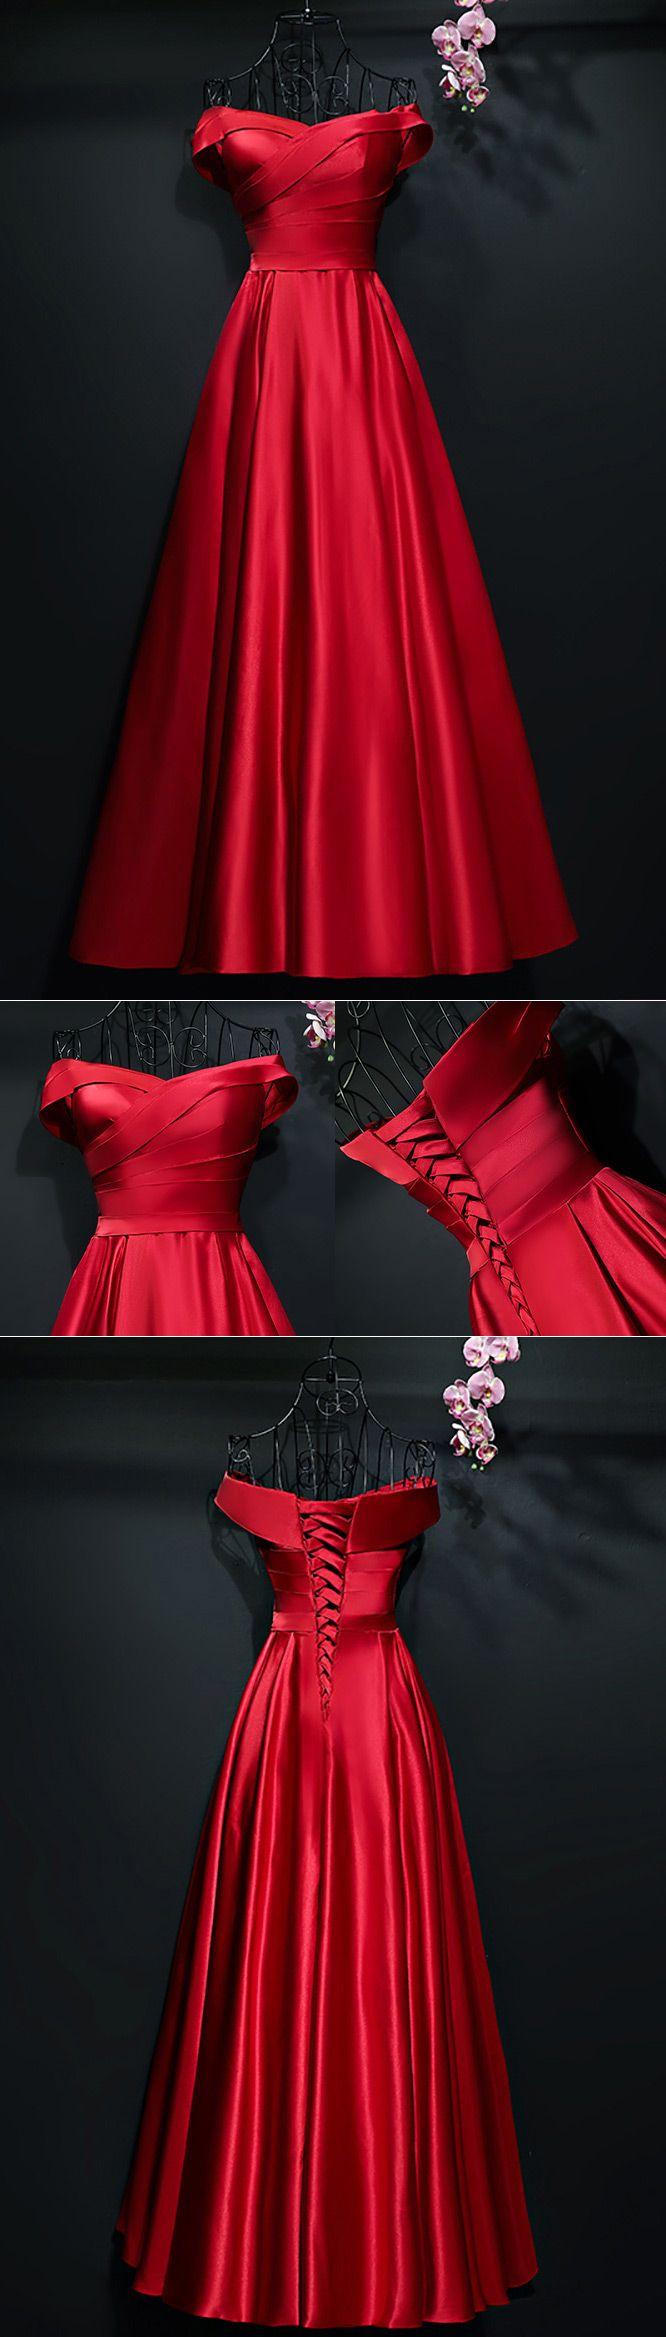 359 best Kleider images on Pinterest | Beautiful dresses, Casual ...